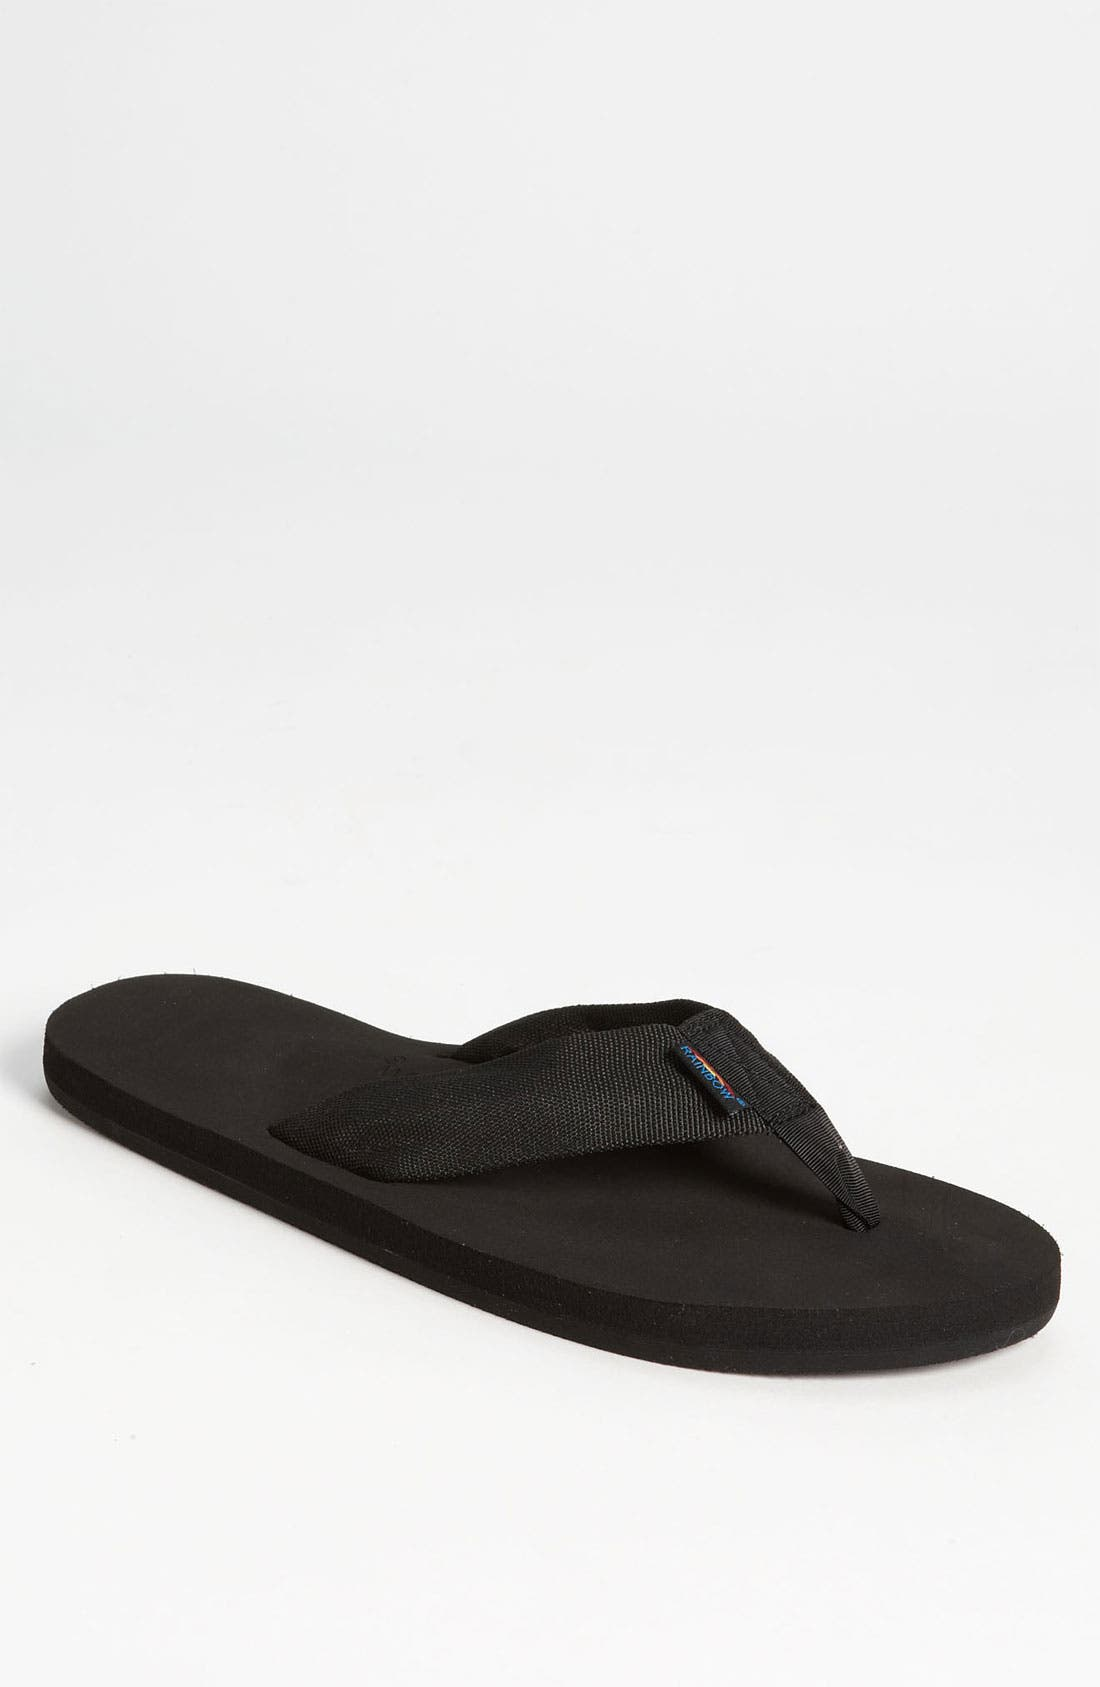 Alternate Image 1 Selected - Rainbow® 'Cloud' Sandal (Men)